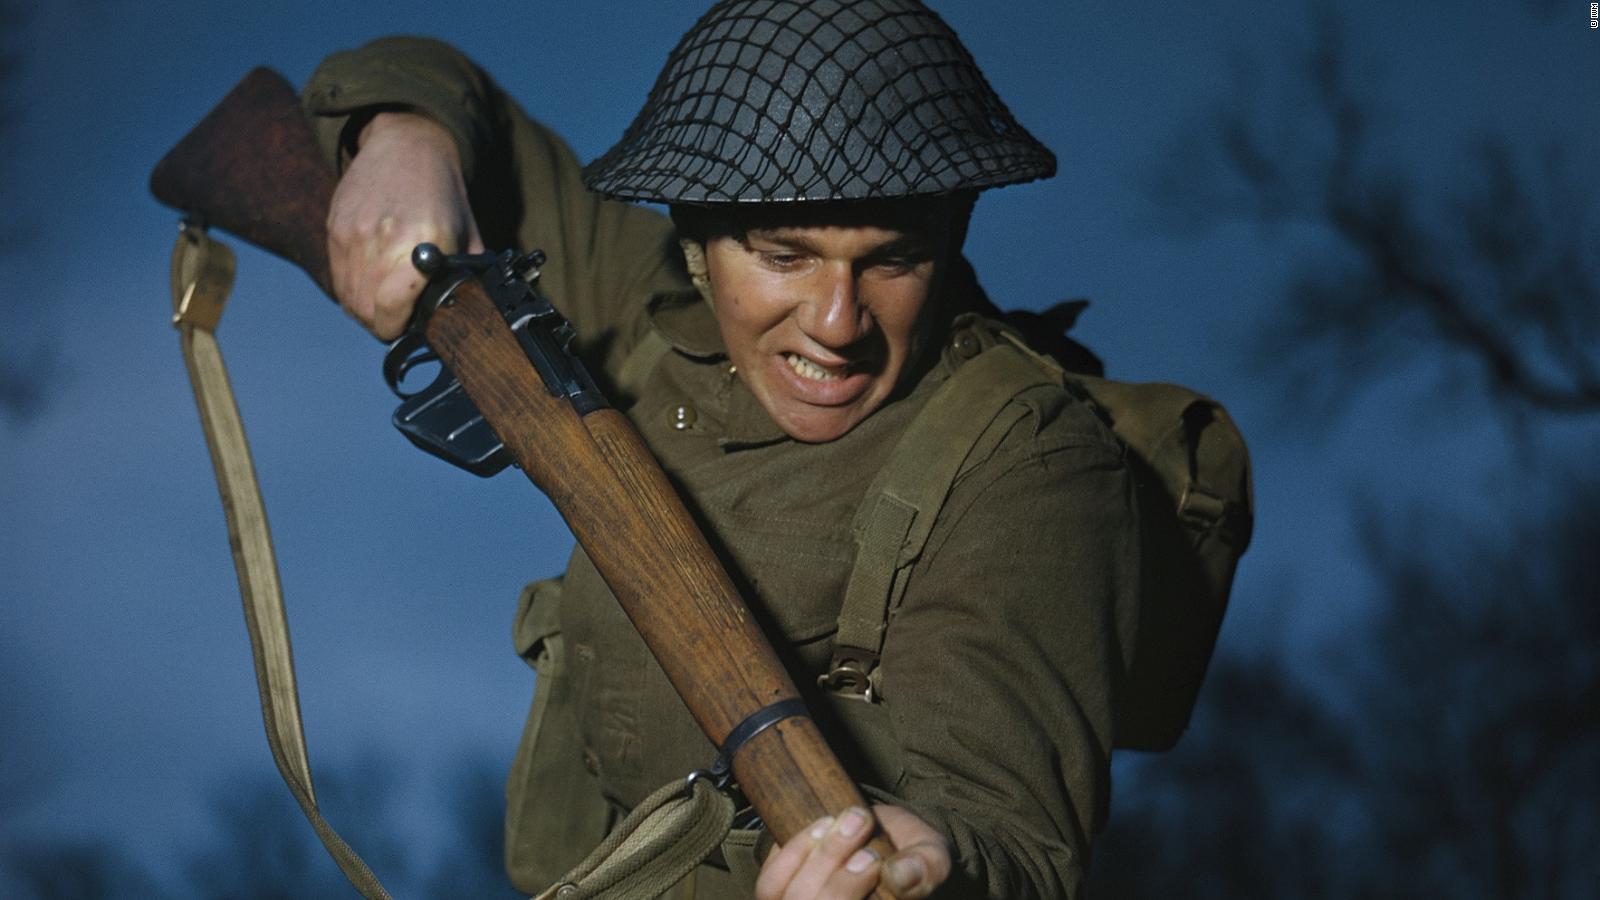 Color Photos Of World War Ii Cast New Light On The War Cnn Style